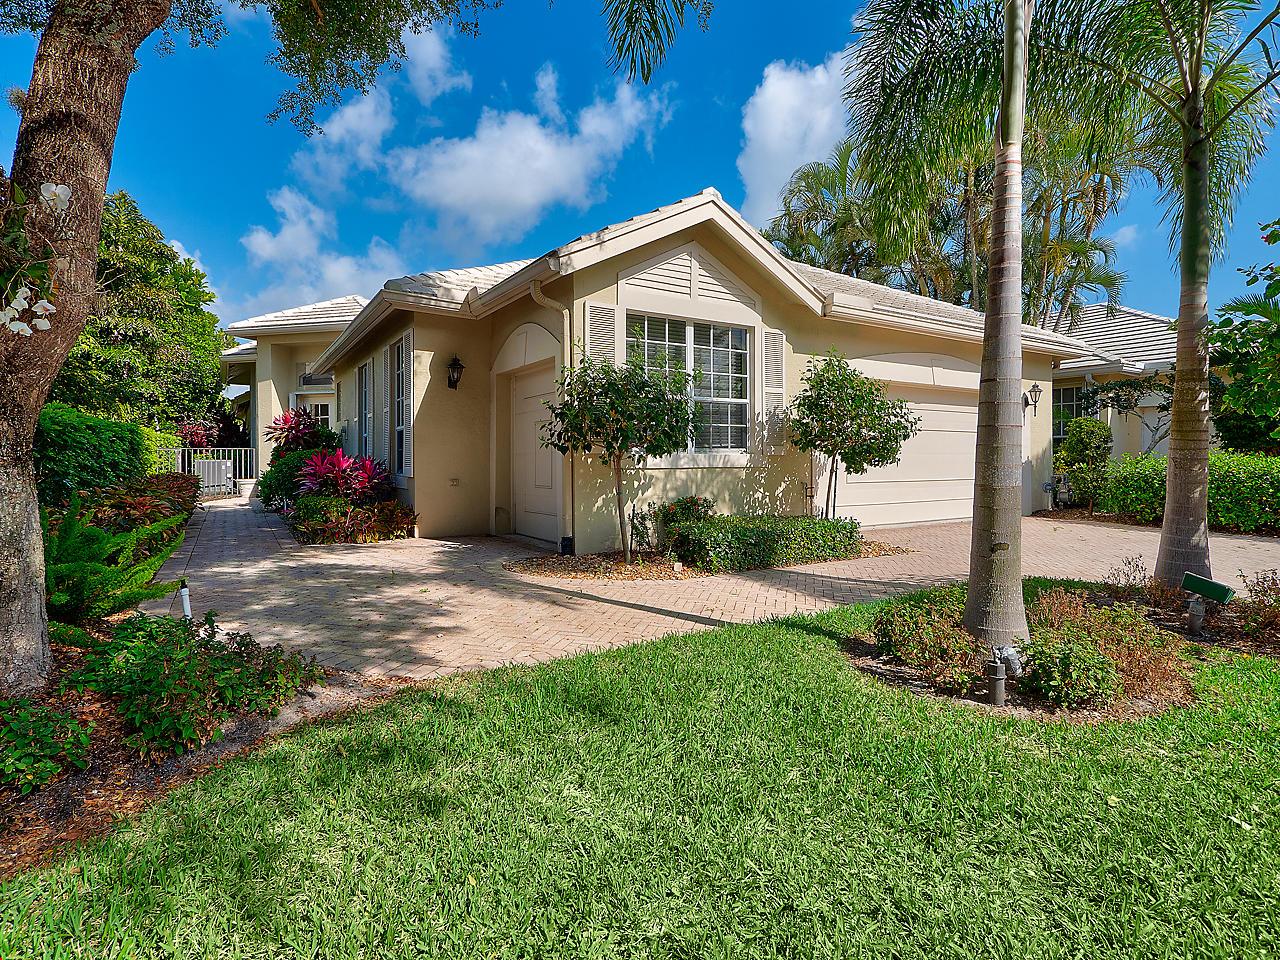 119 Victoria Bay Court, Palm Beach Gardens, Florida 33418, 3 Bedrooms Bedrooms, ,3 BathroomsBathrooms,A,Single family,Victoria Bay,RX-10612624